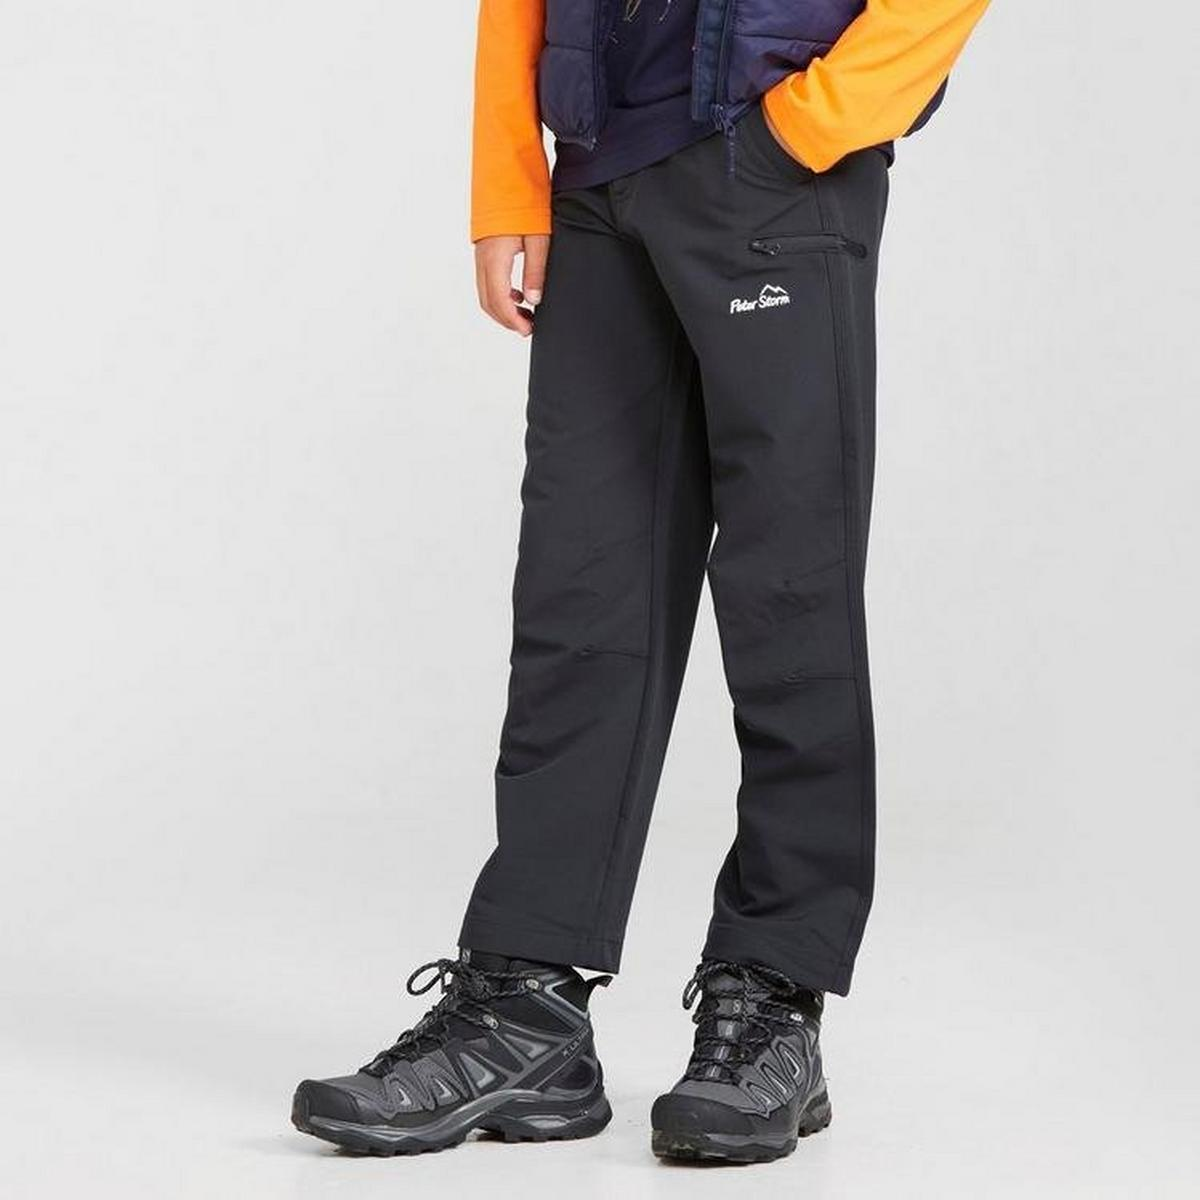 Peter Storm Kid's Terrain Trouser - Black